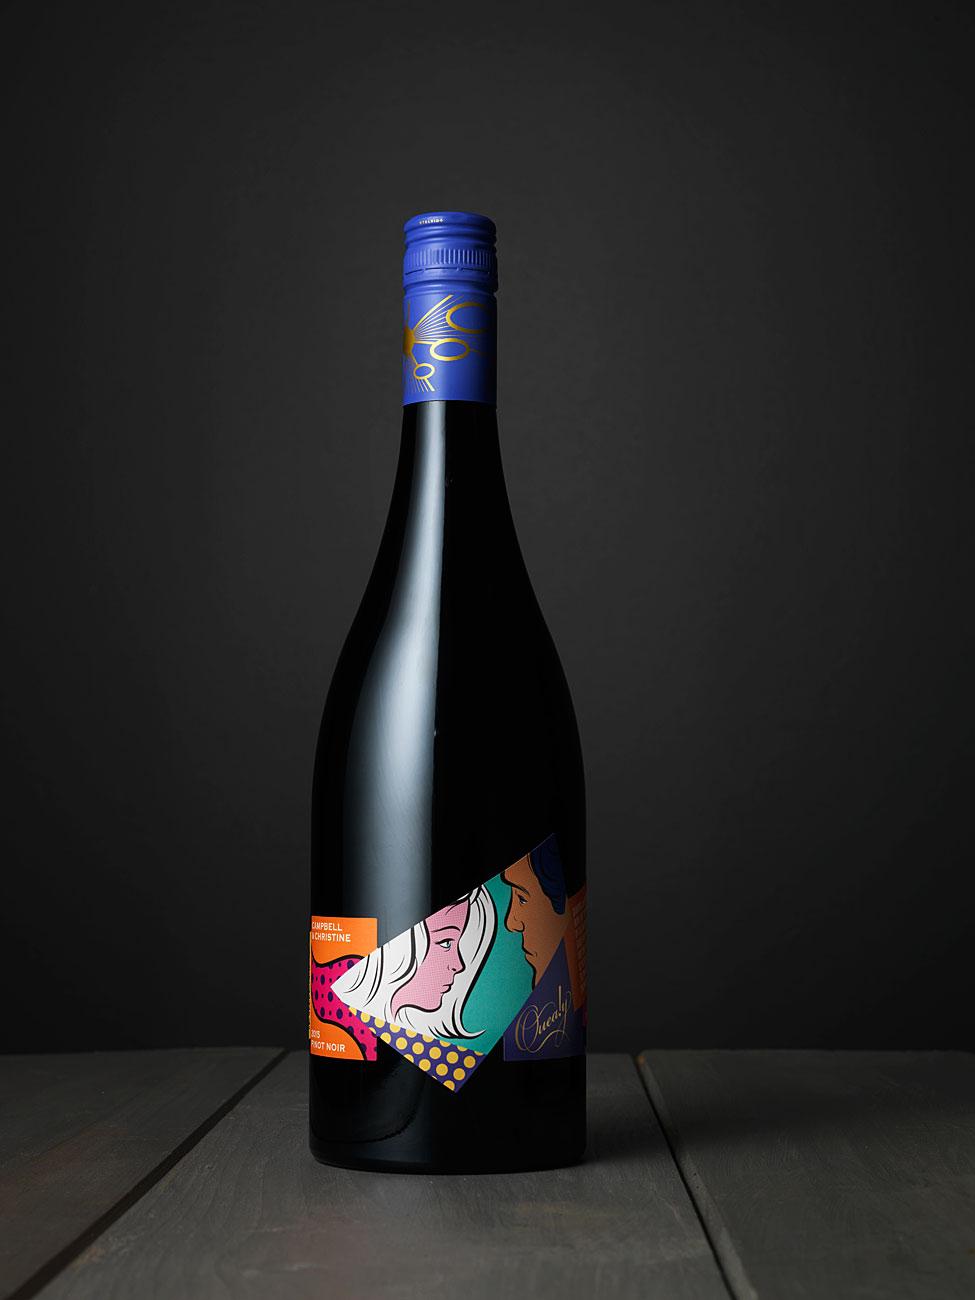 wine-bottle-photography-ijproductions5.jpg